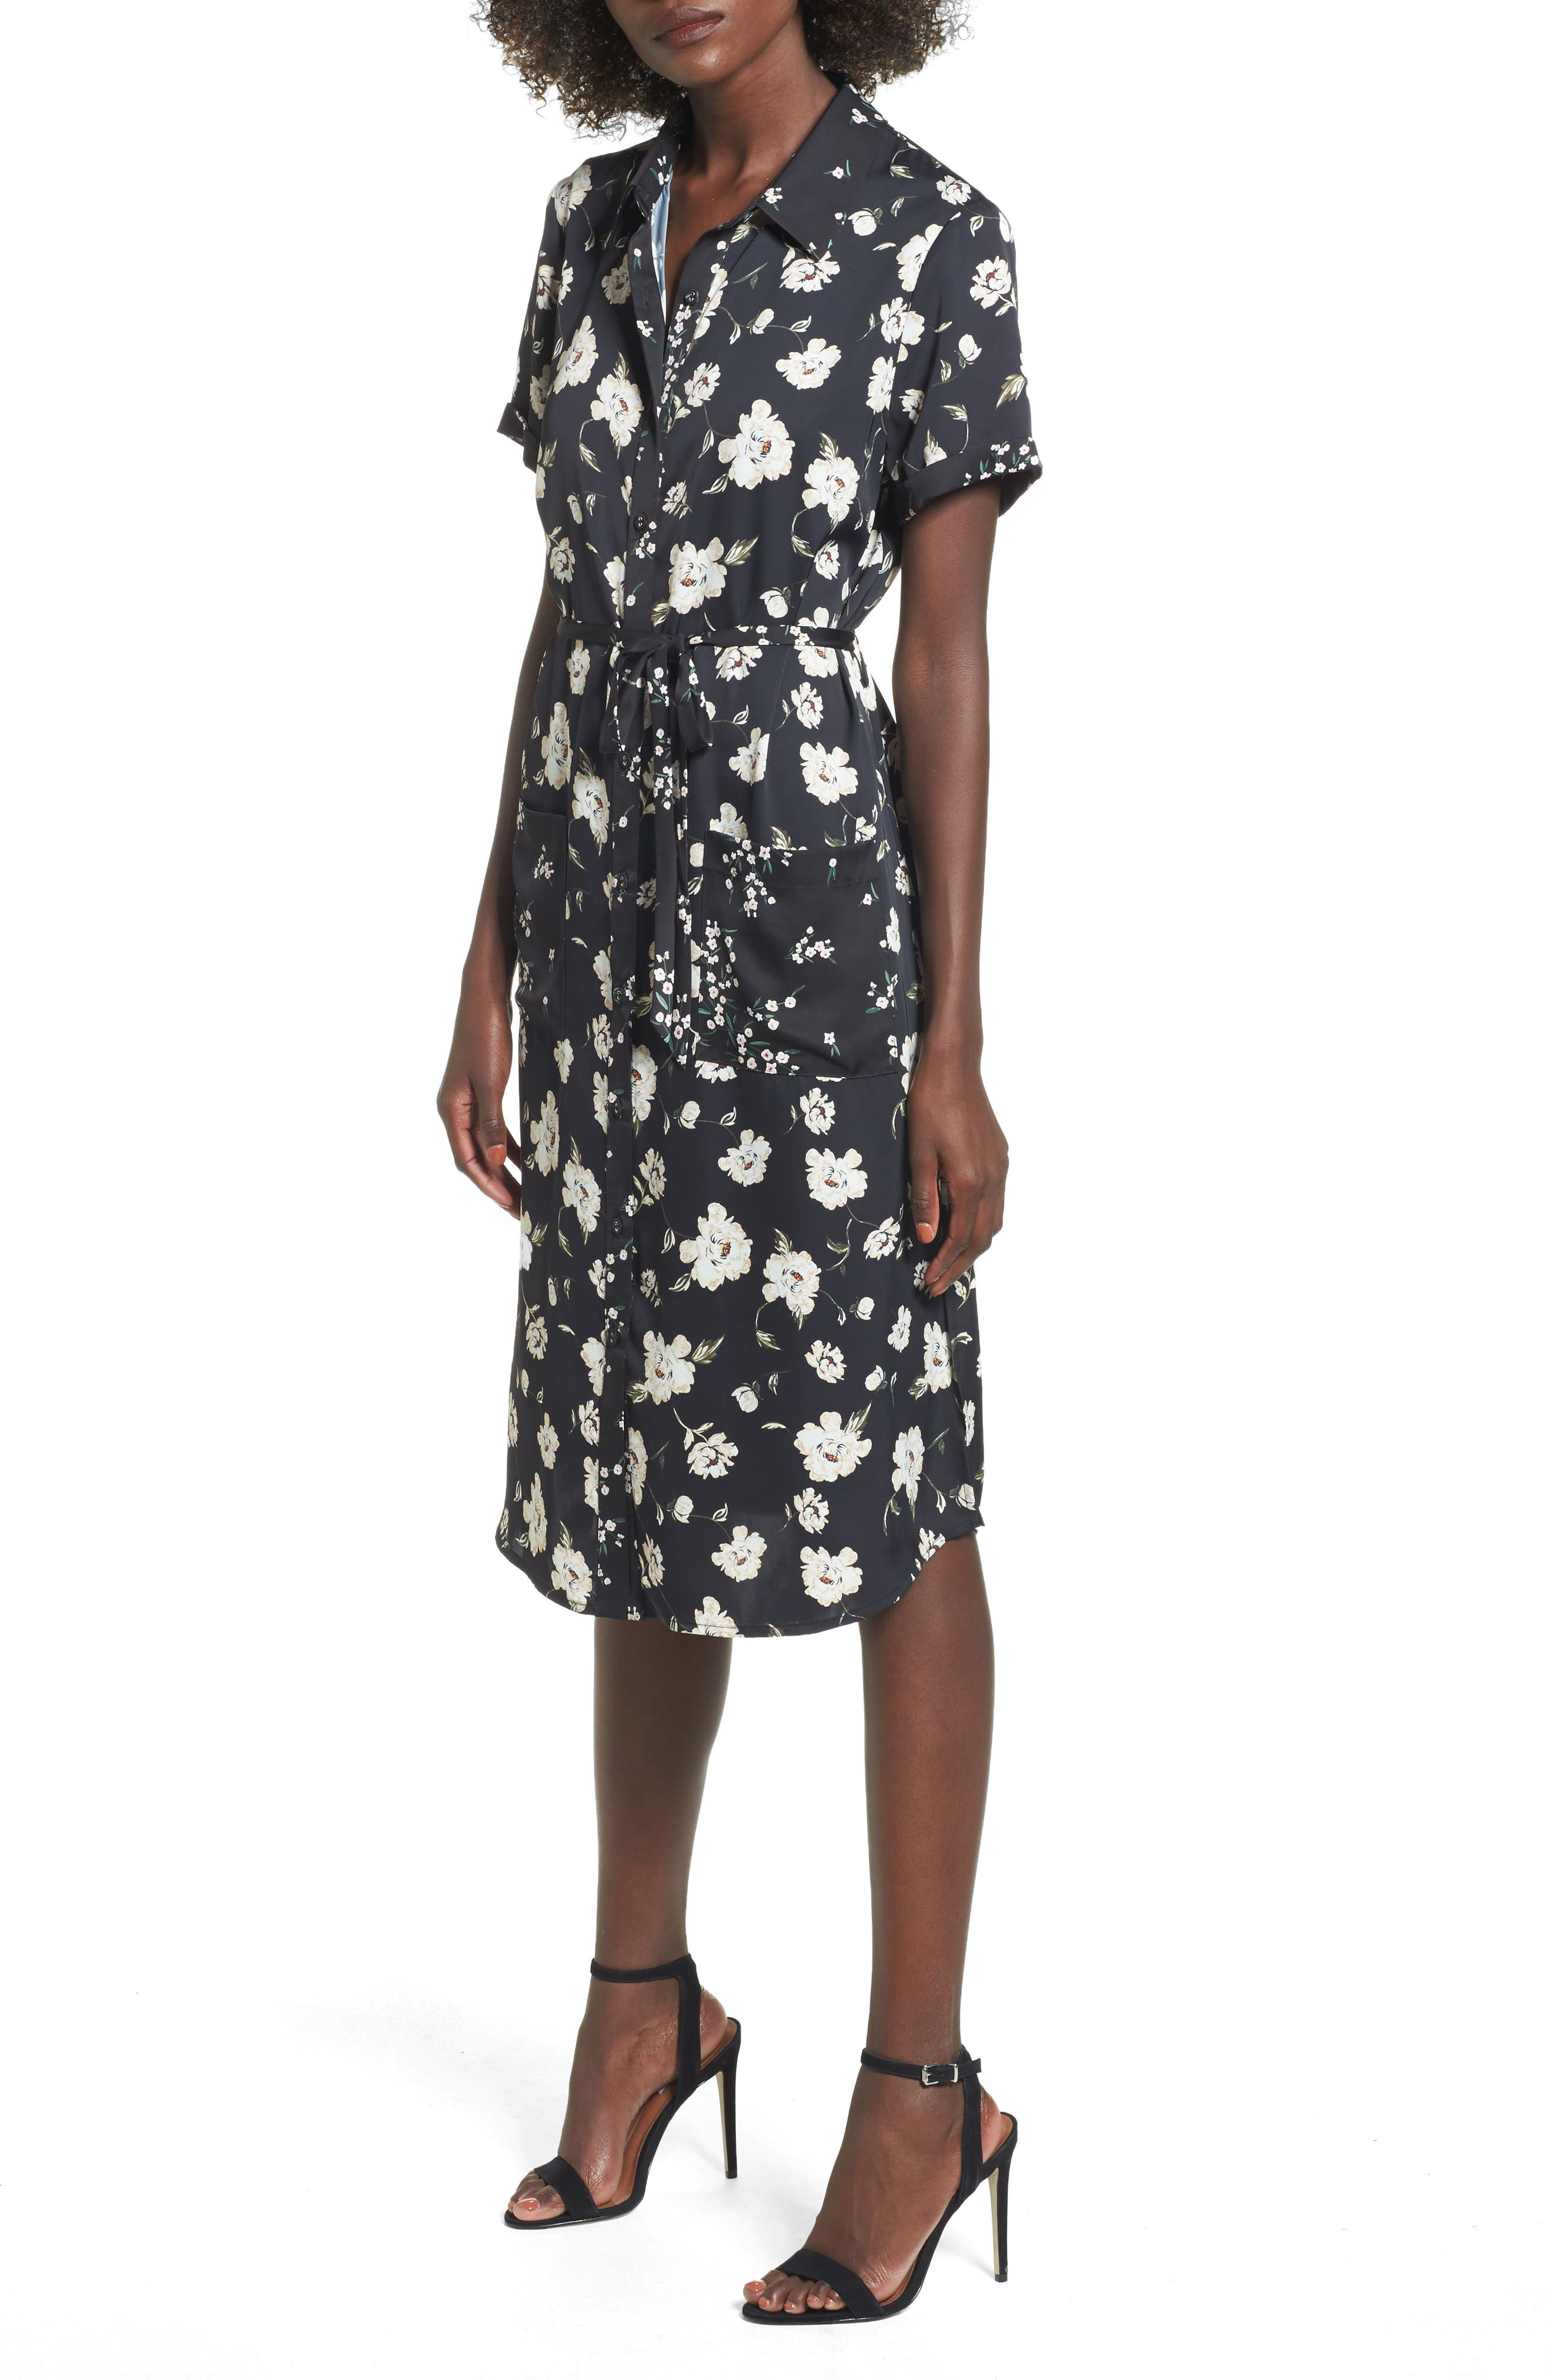 L'Academie The Shirt Dress Midi Dress,                             Main thumbnail 1, color,                             001